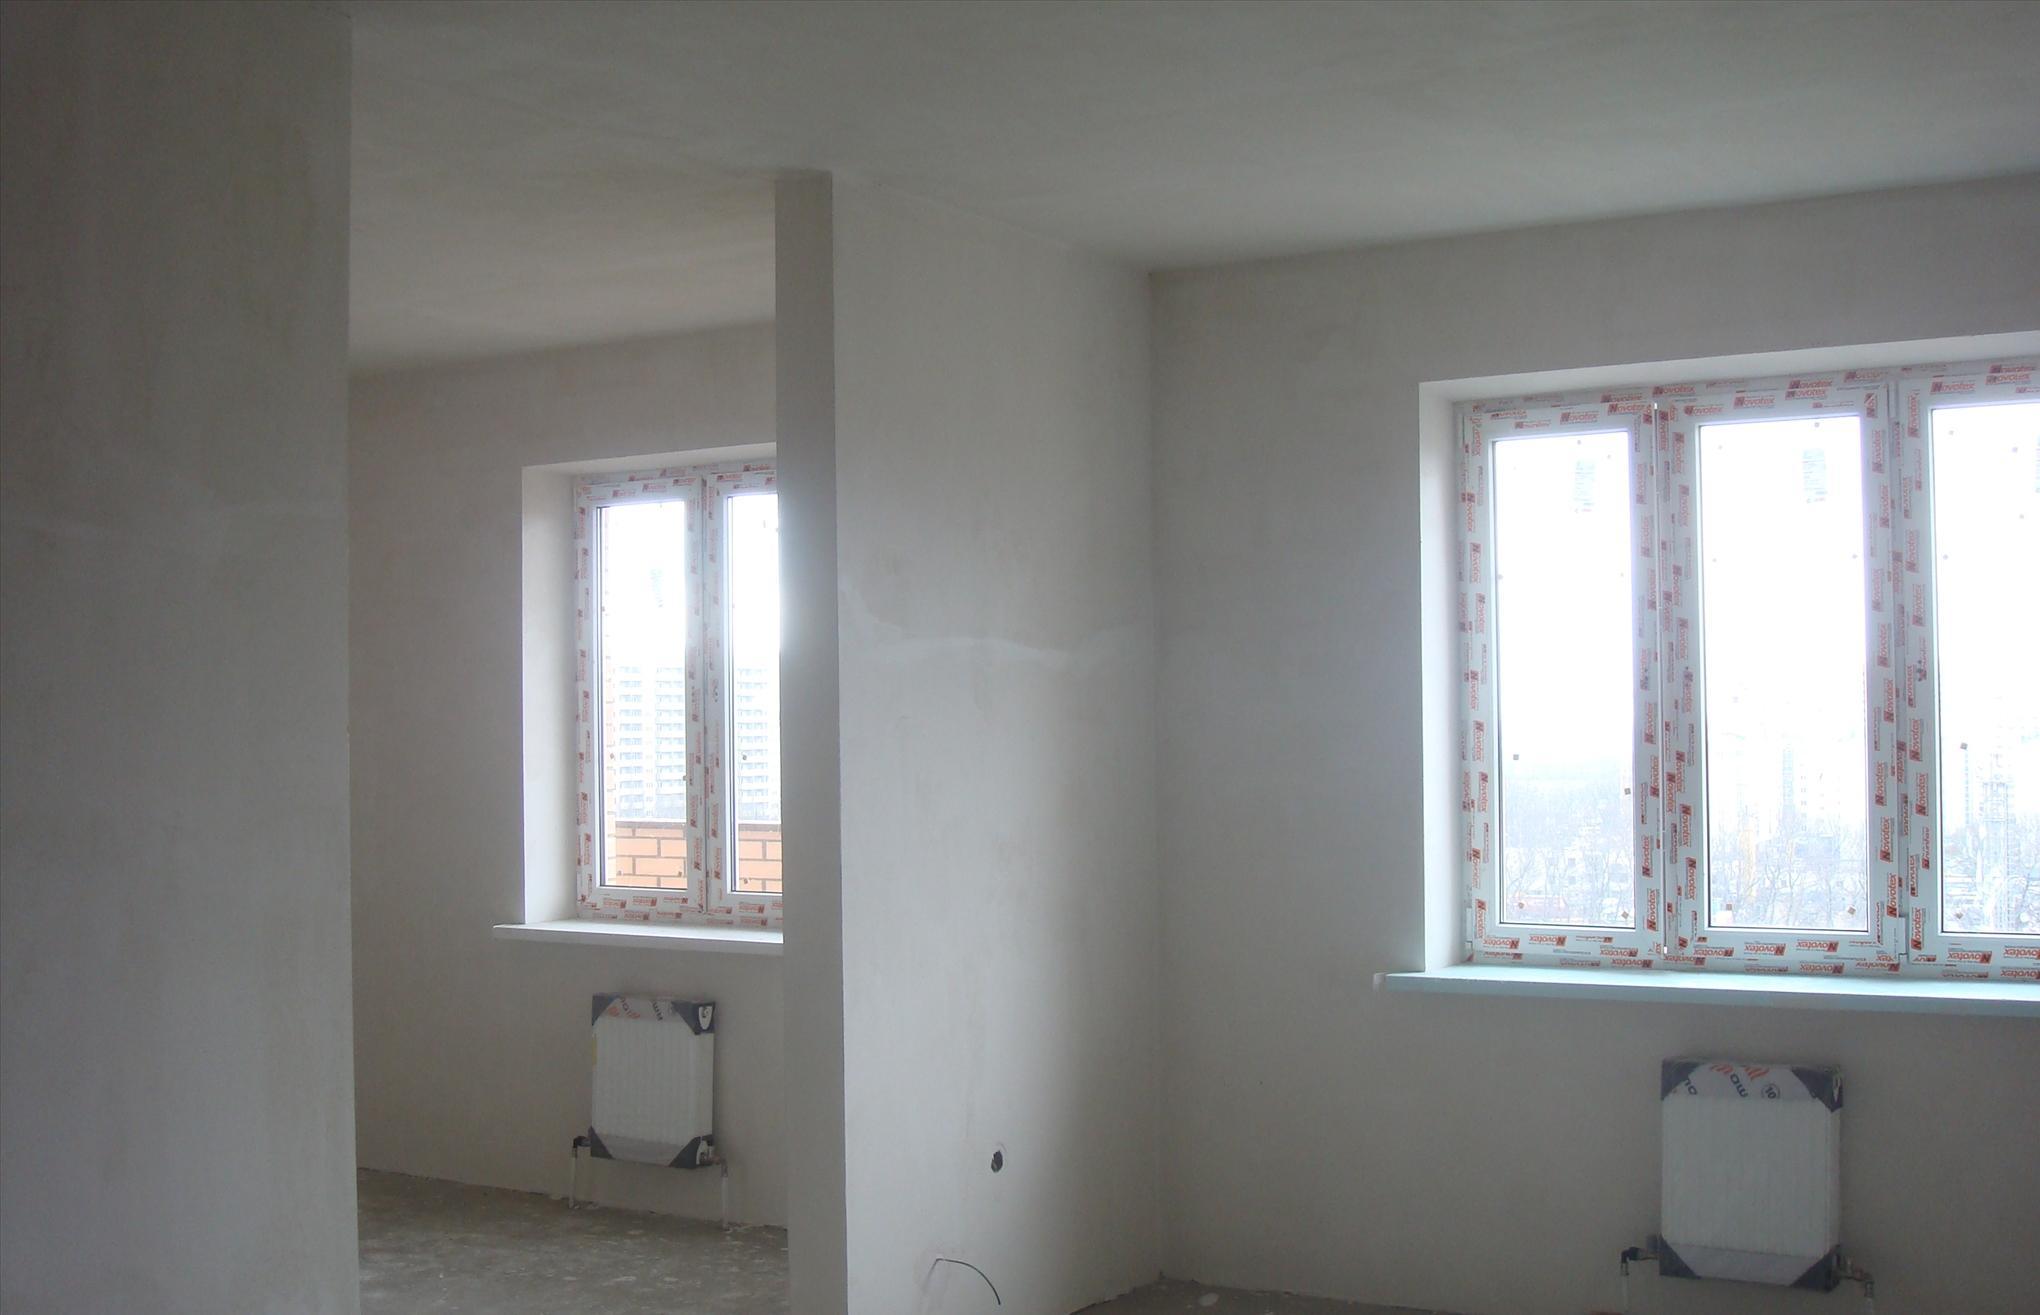 1-к квартира | Краснодар, Дальняя, р-н ФМР, 4 фото - 1